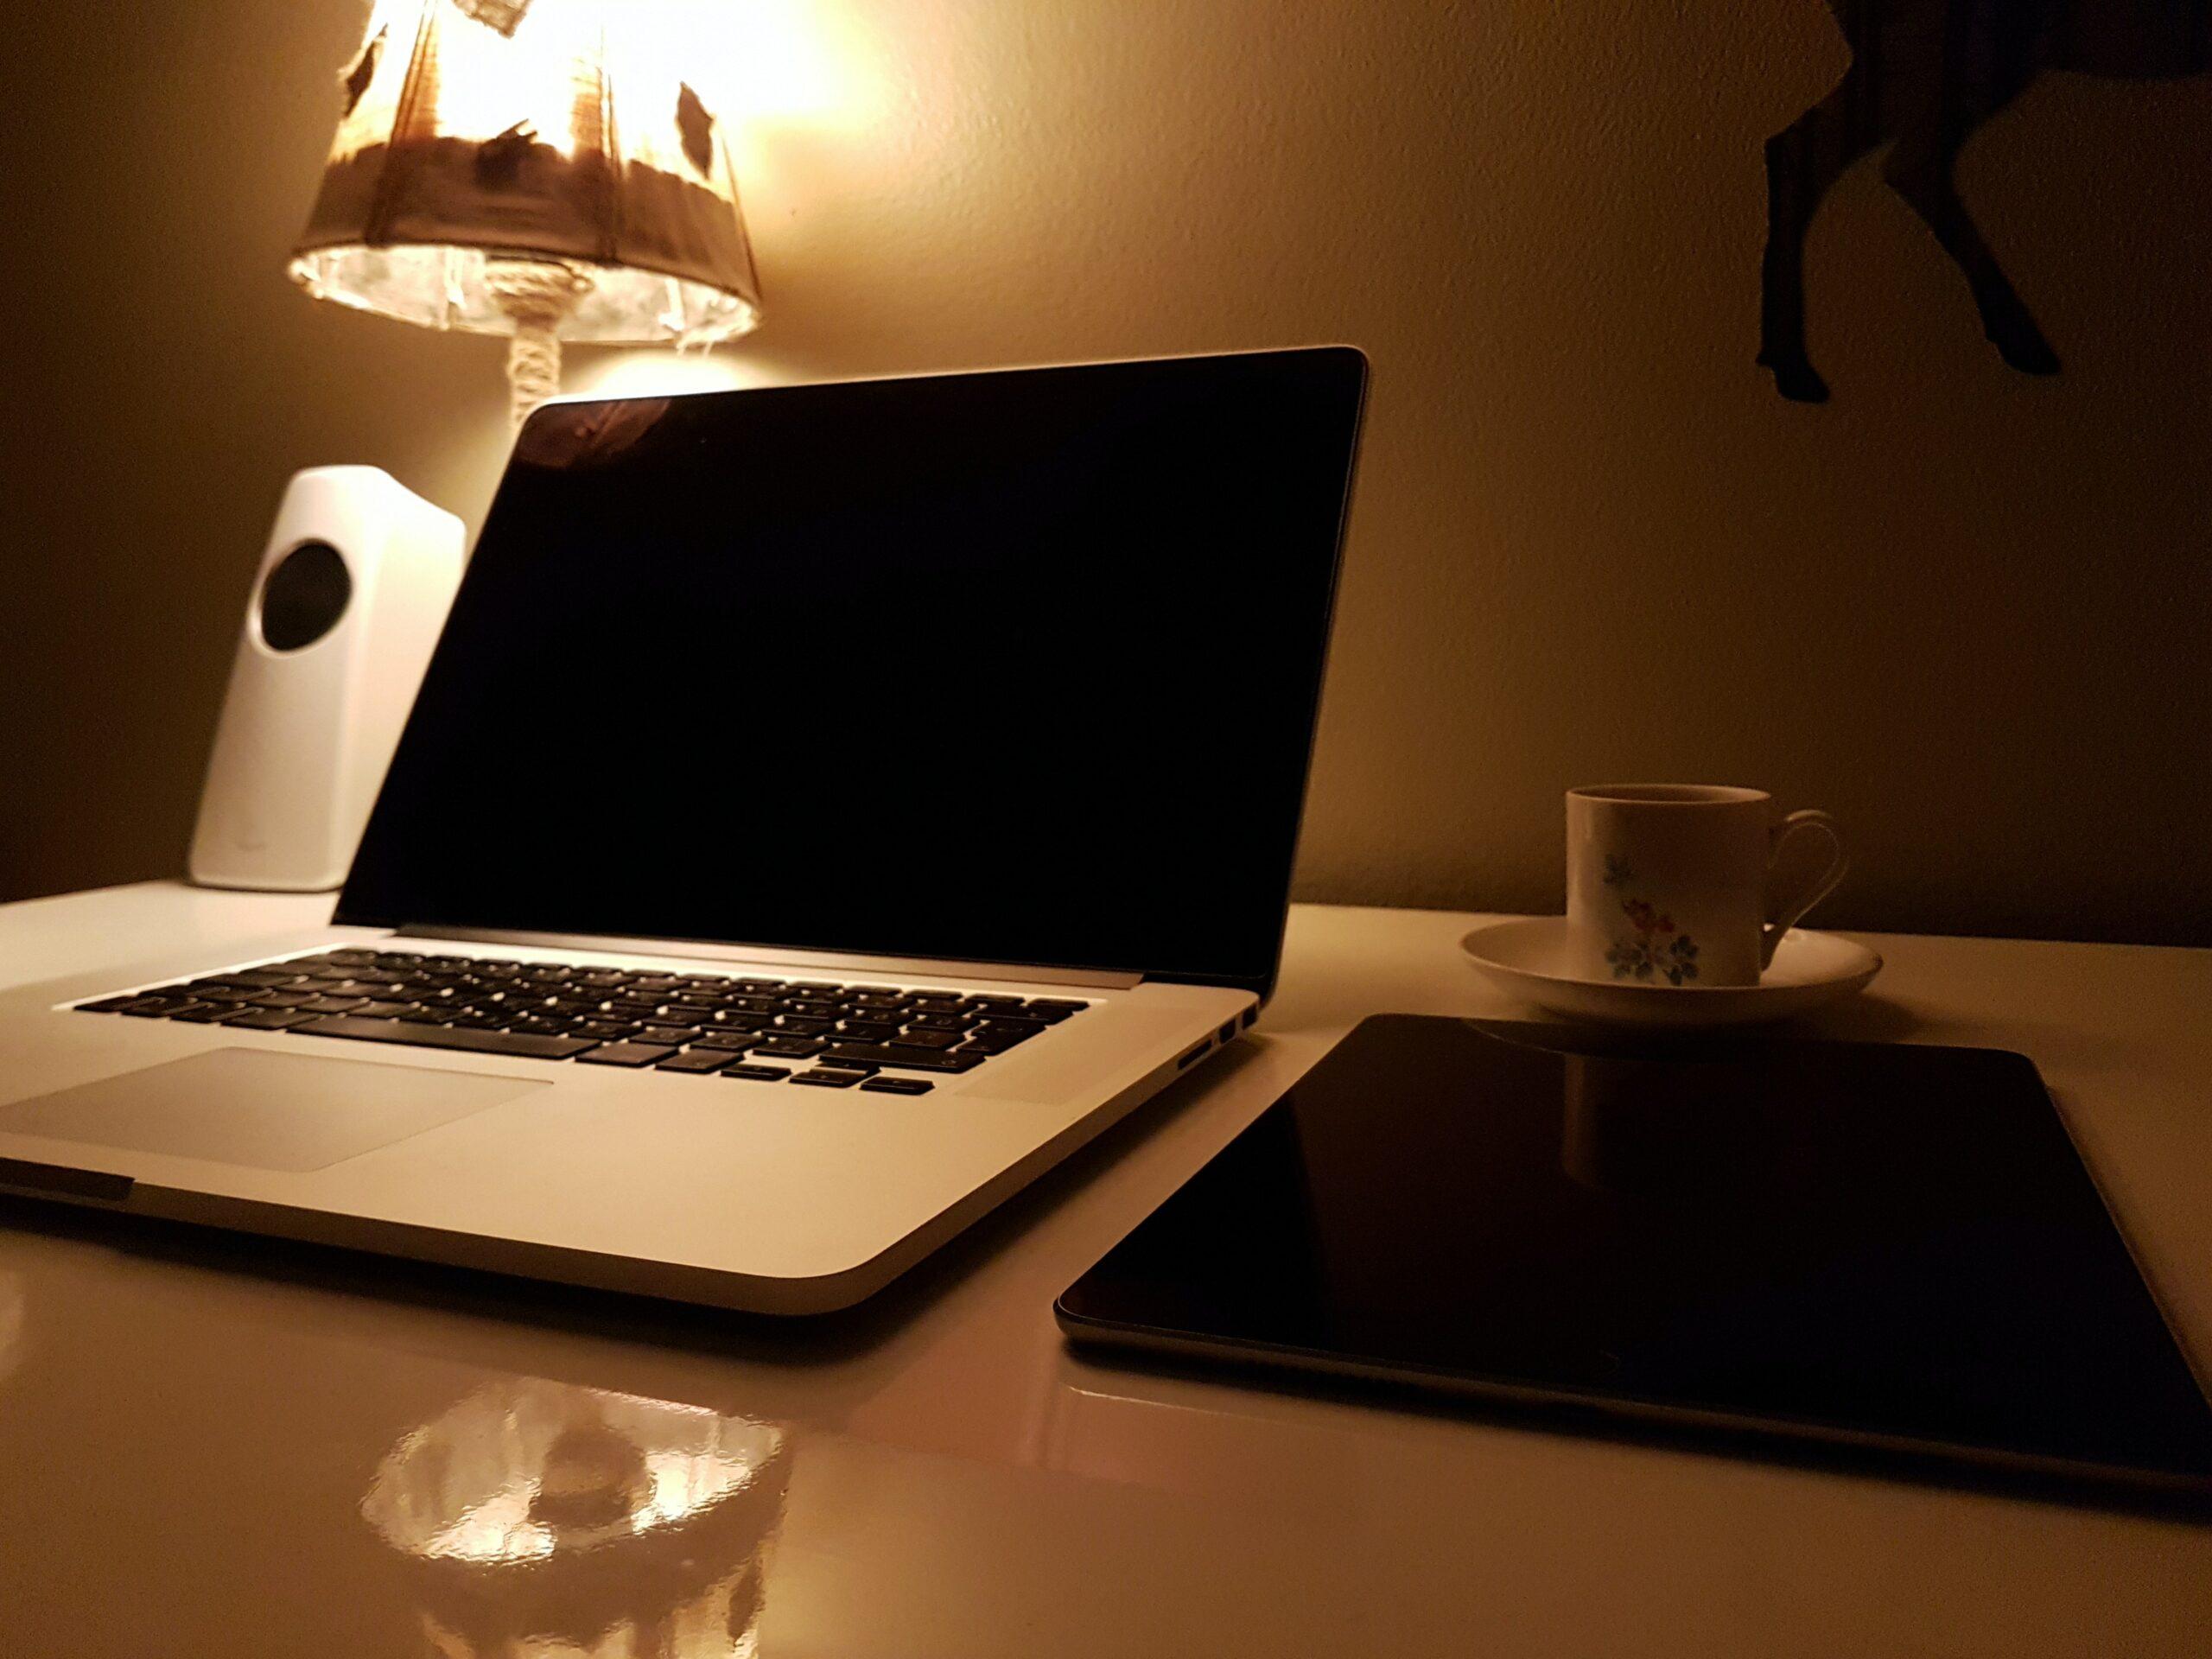 Penyebab Kipas Laptop Berisik